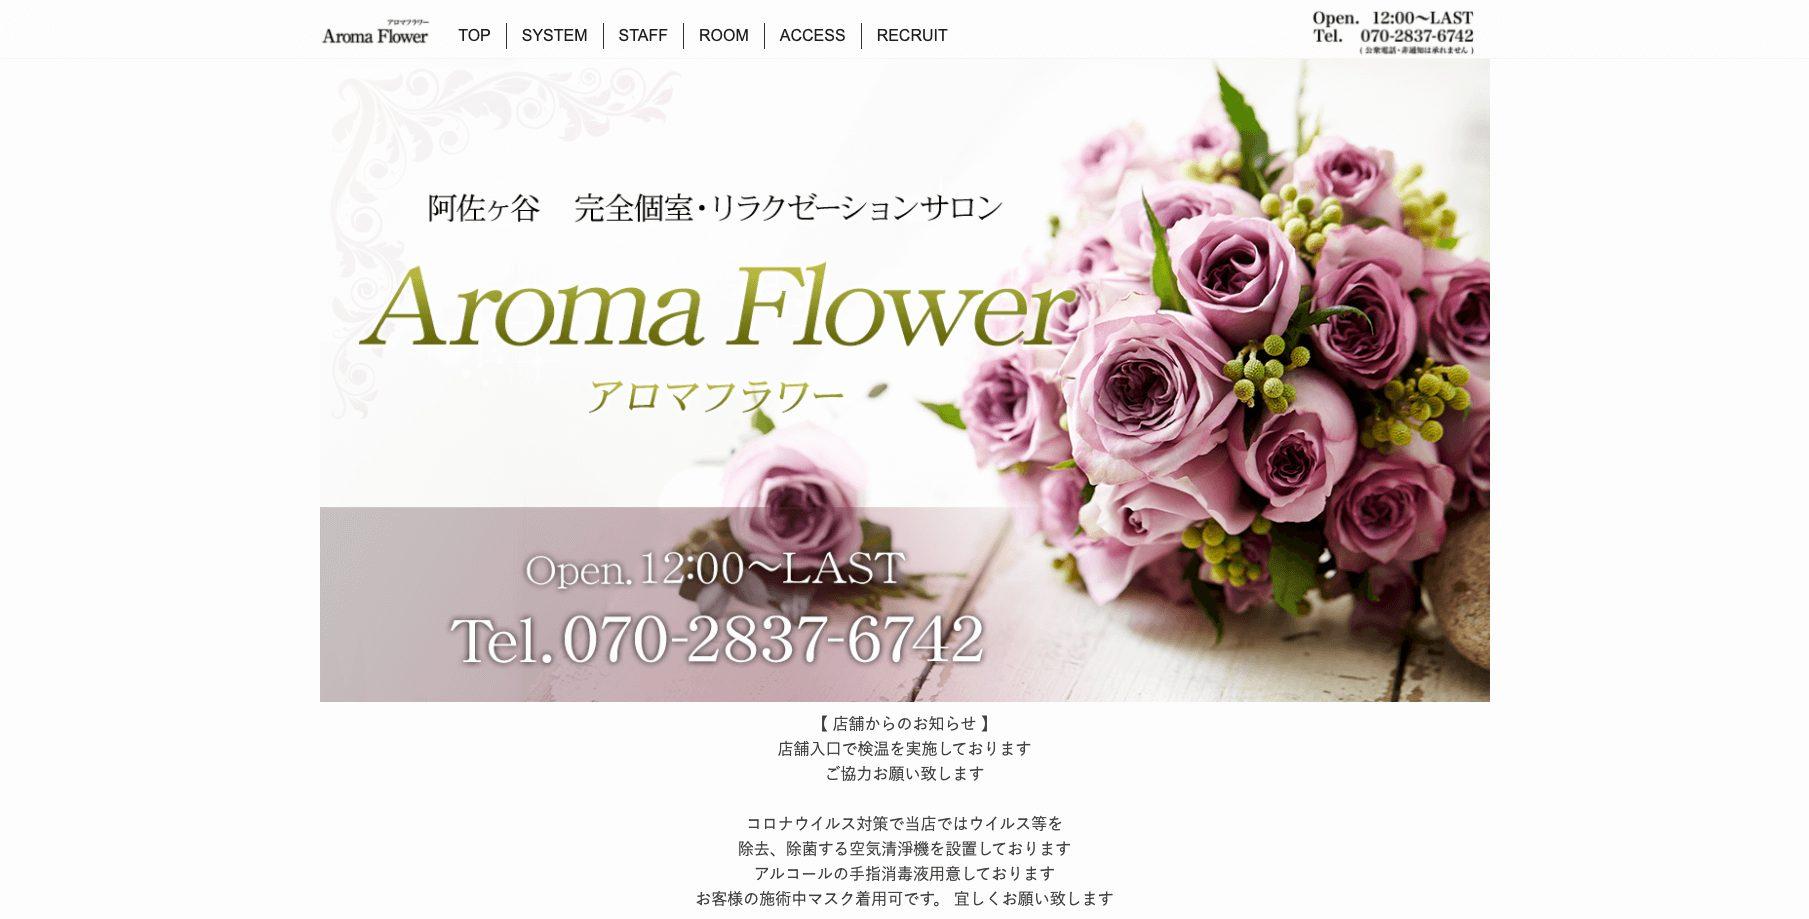 Aroma Flower(アロマフラワー)